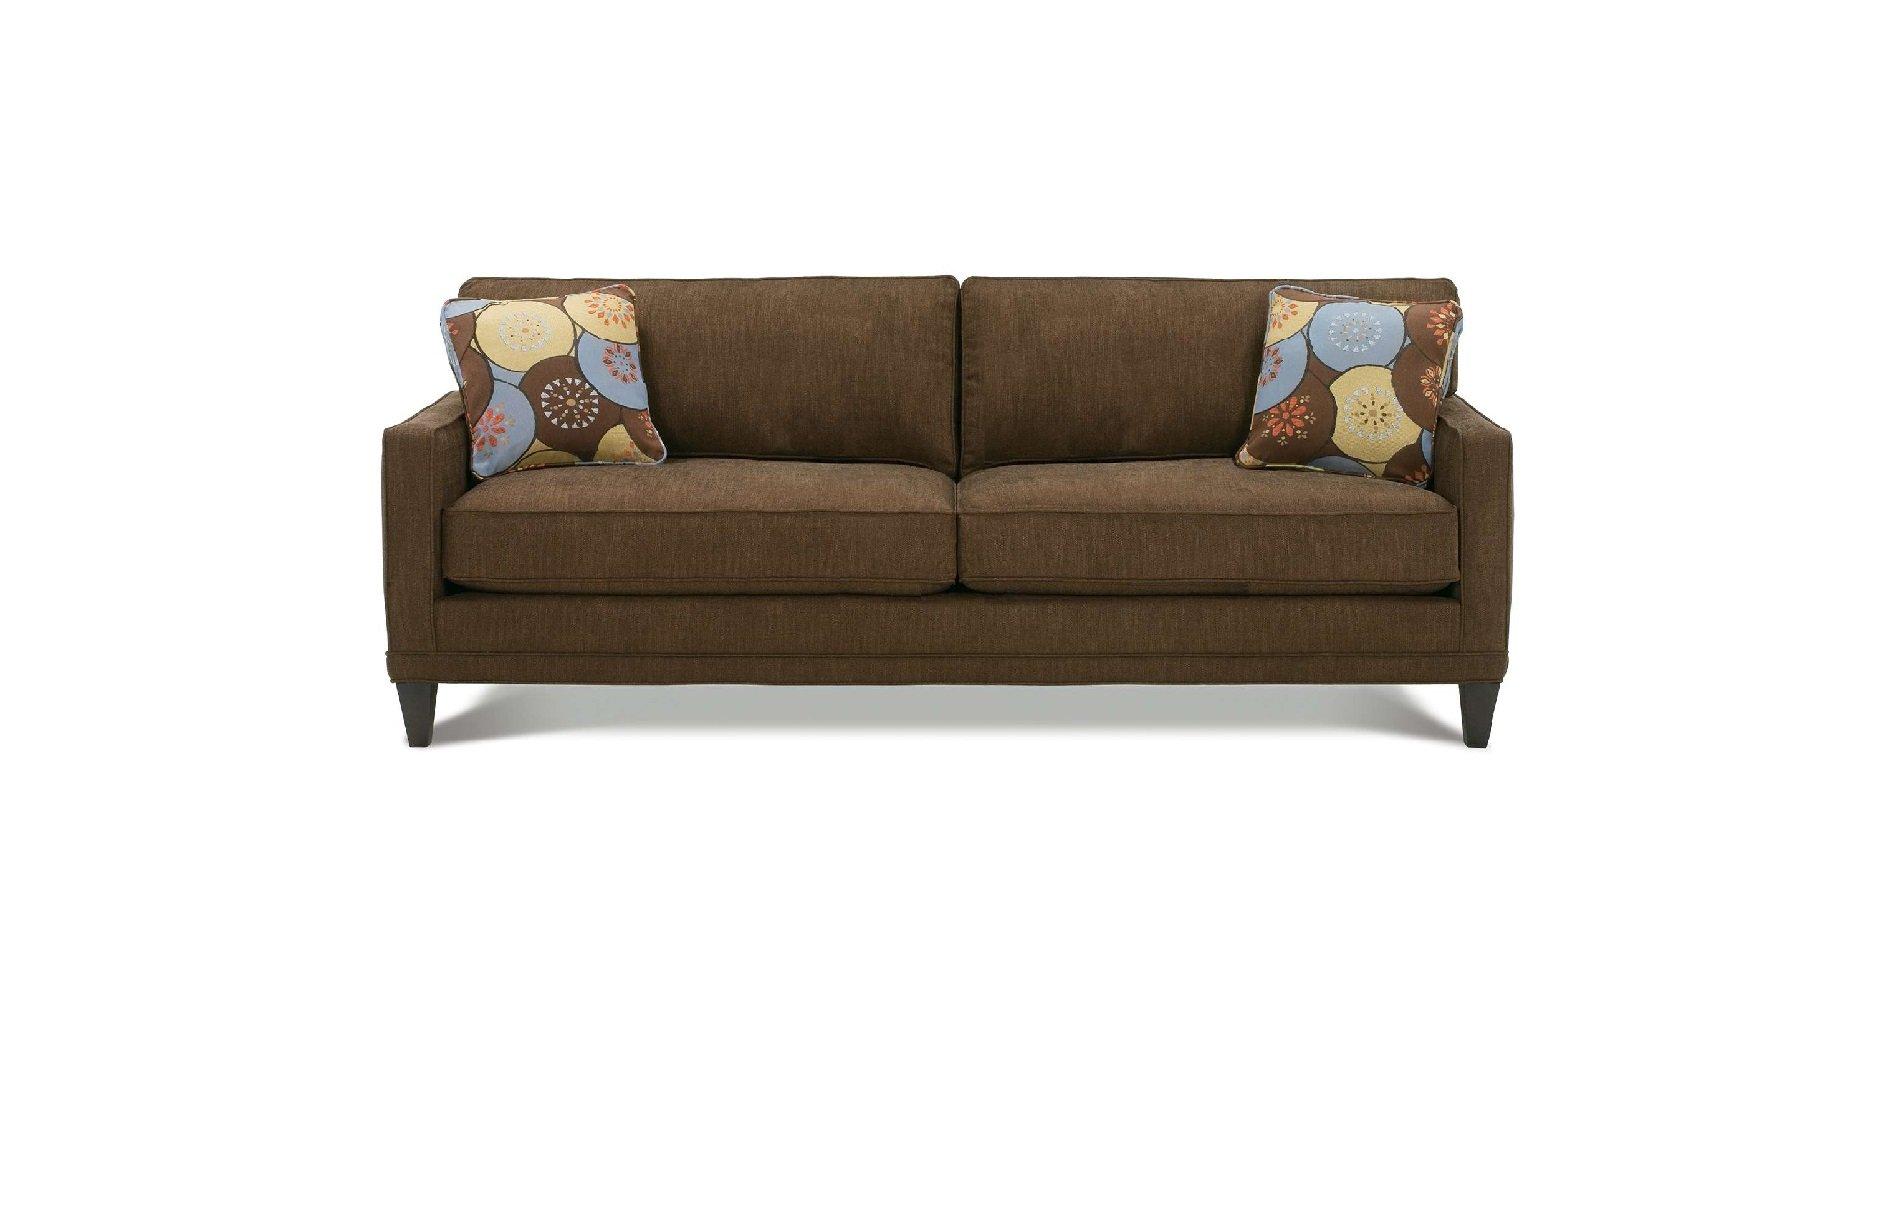 Rowe Townsend Two Cushion Sleeper Sofa